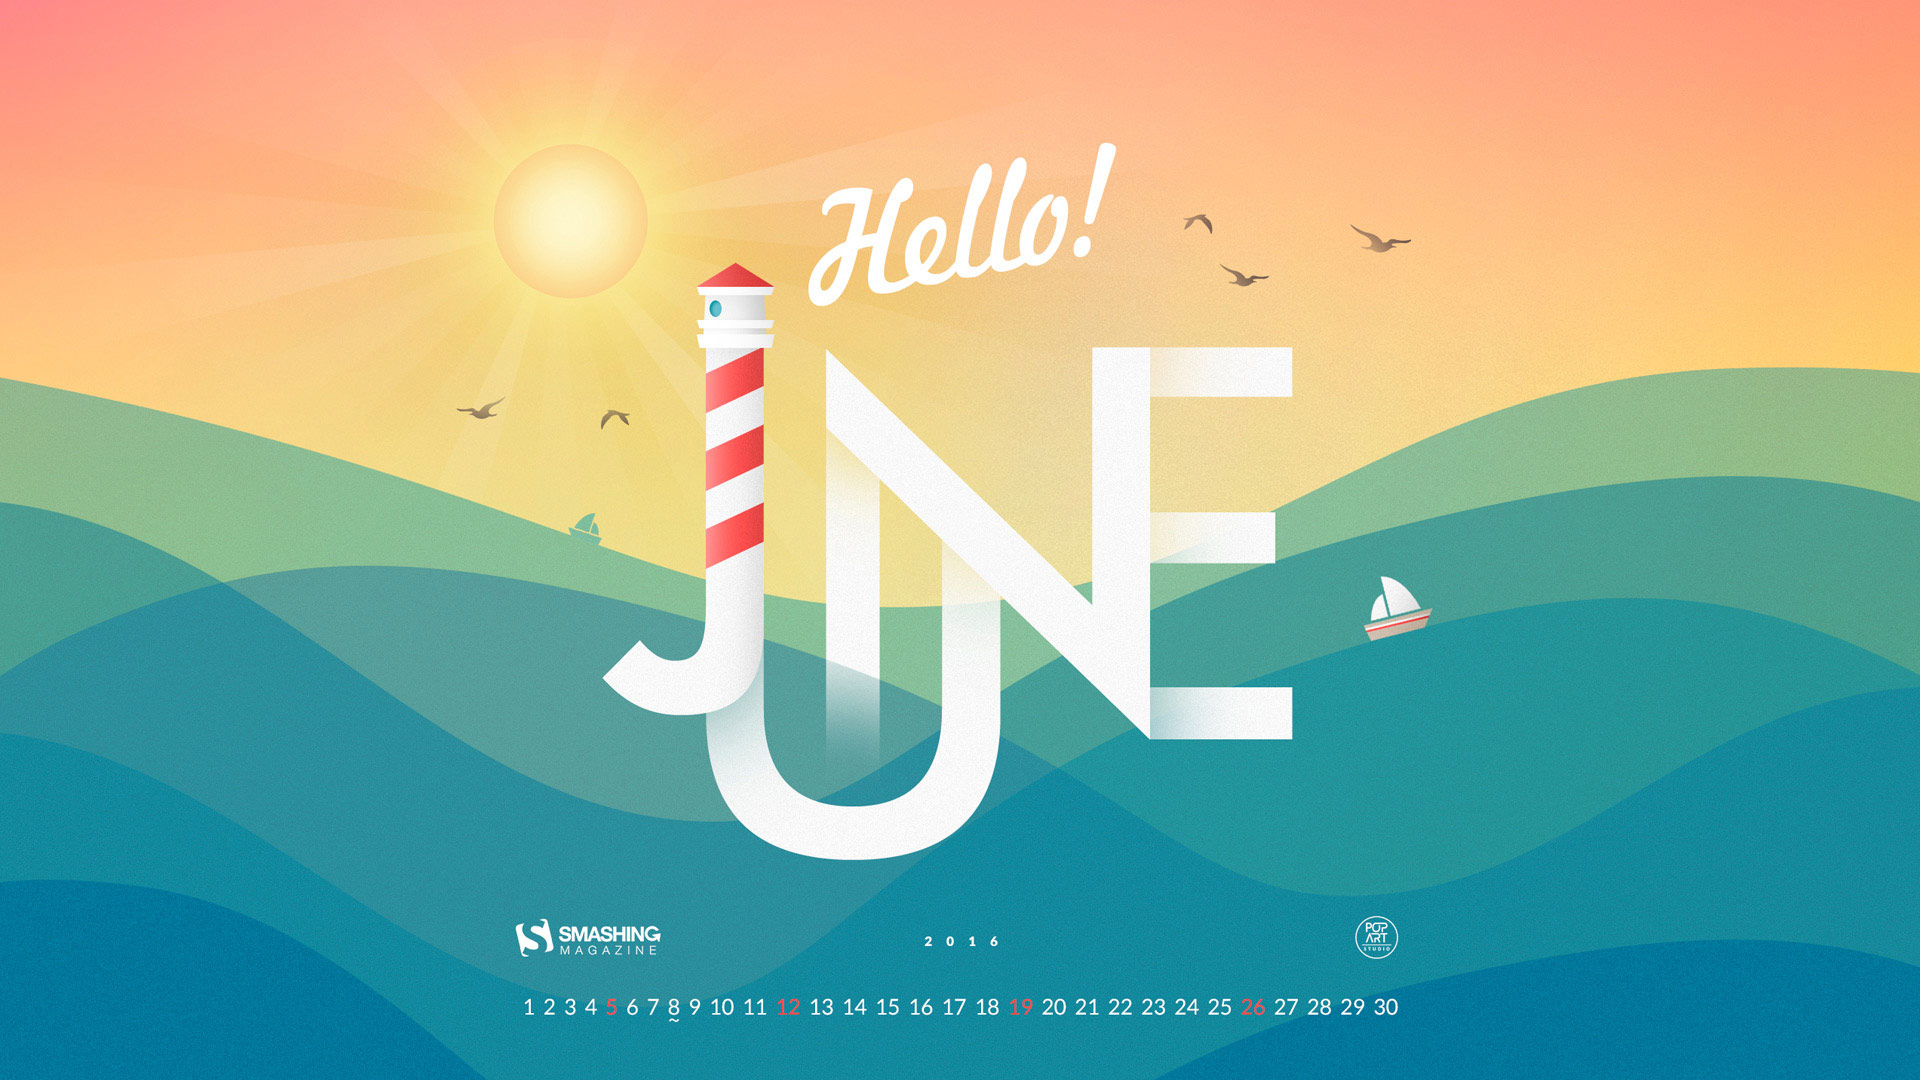 Desktop Wallpaper Calendars June 2016 Smashing Magazine 1920x1080